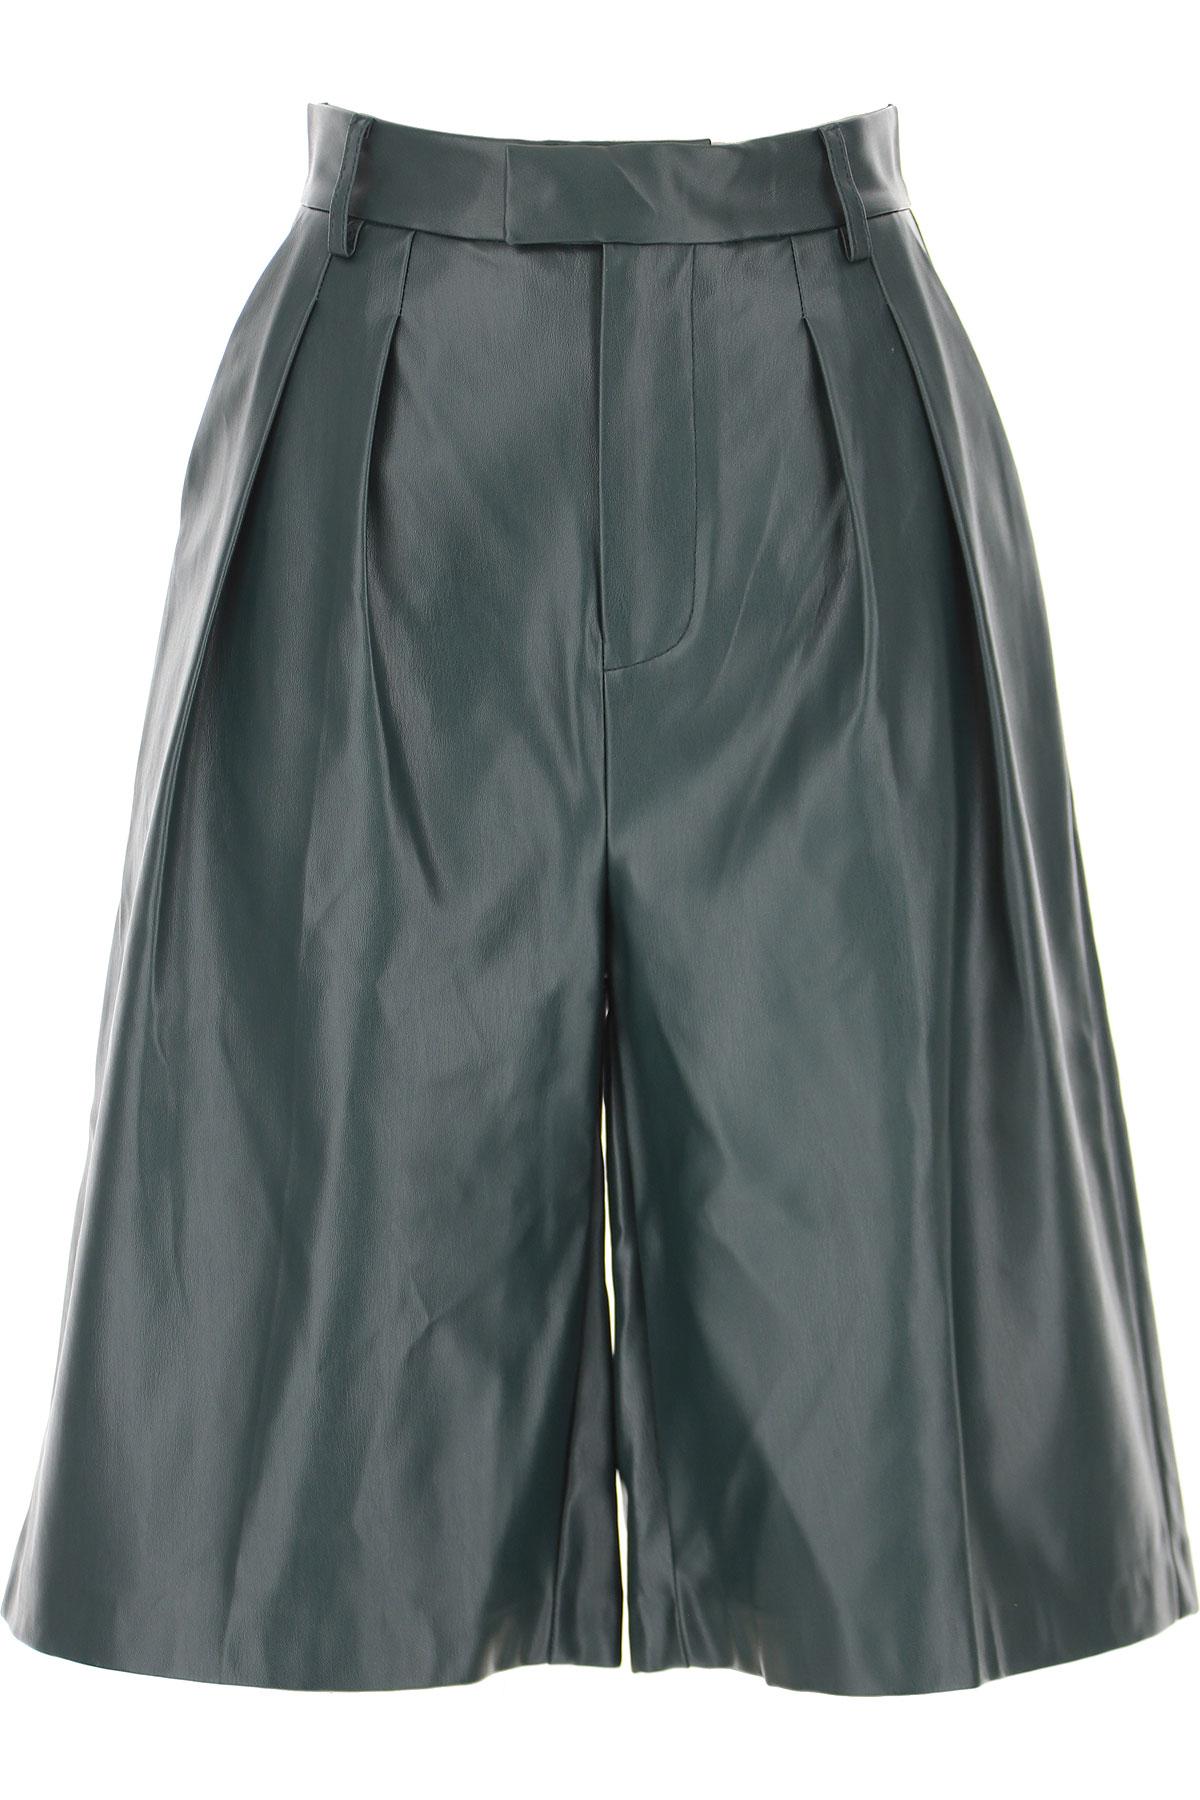 Weili Zheng Shorts for Women On Sale, Dark Green, polyurethane, 2019, 28